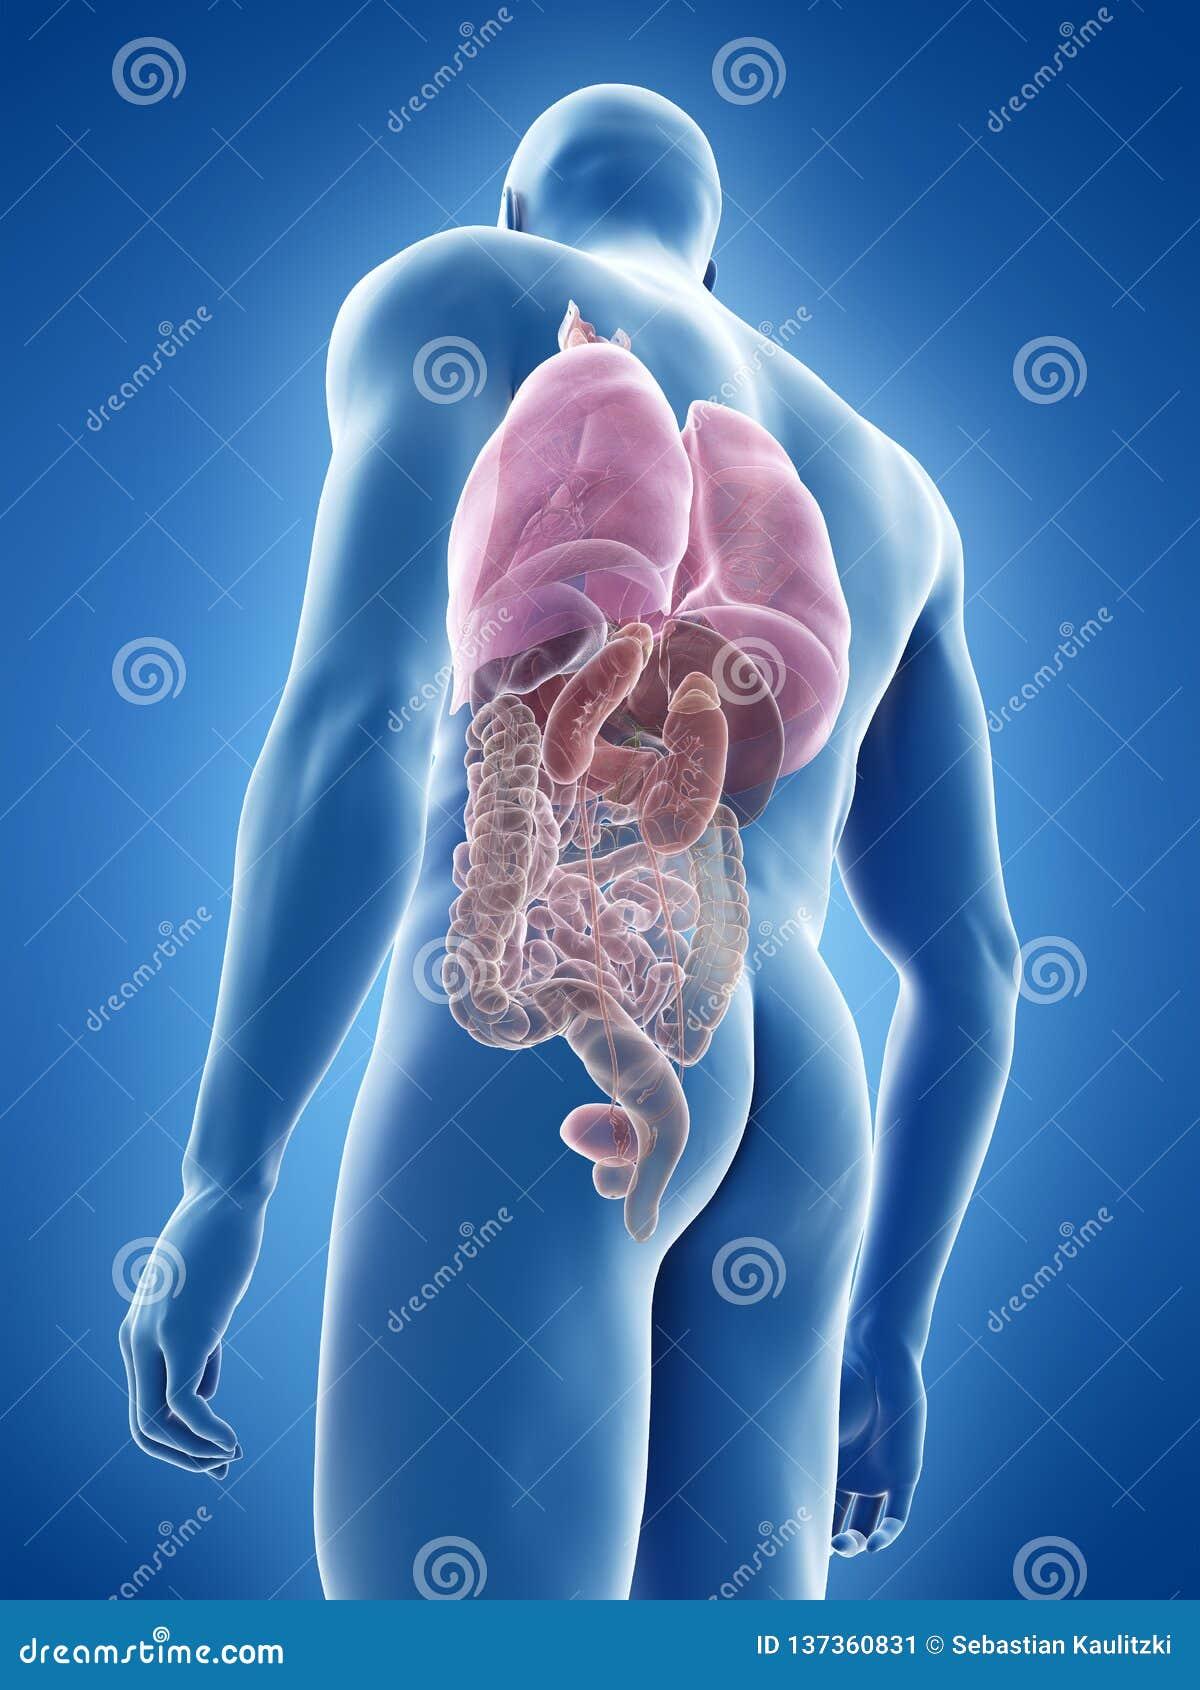 the human organs